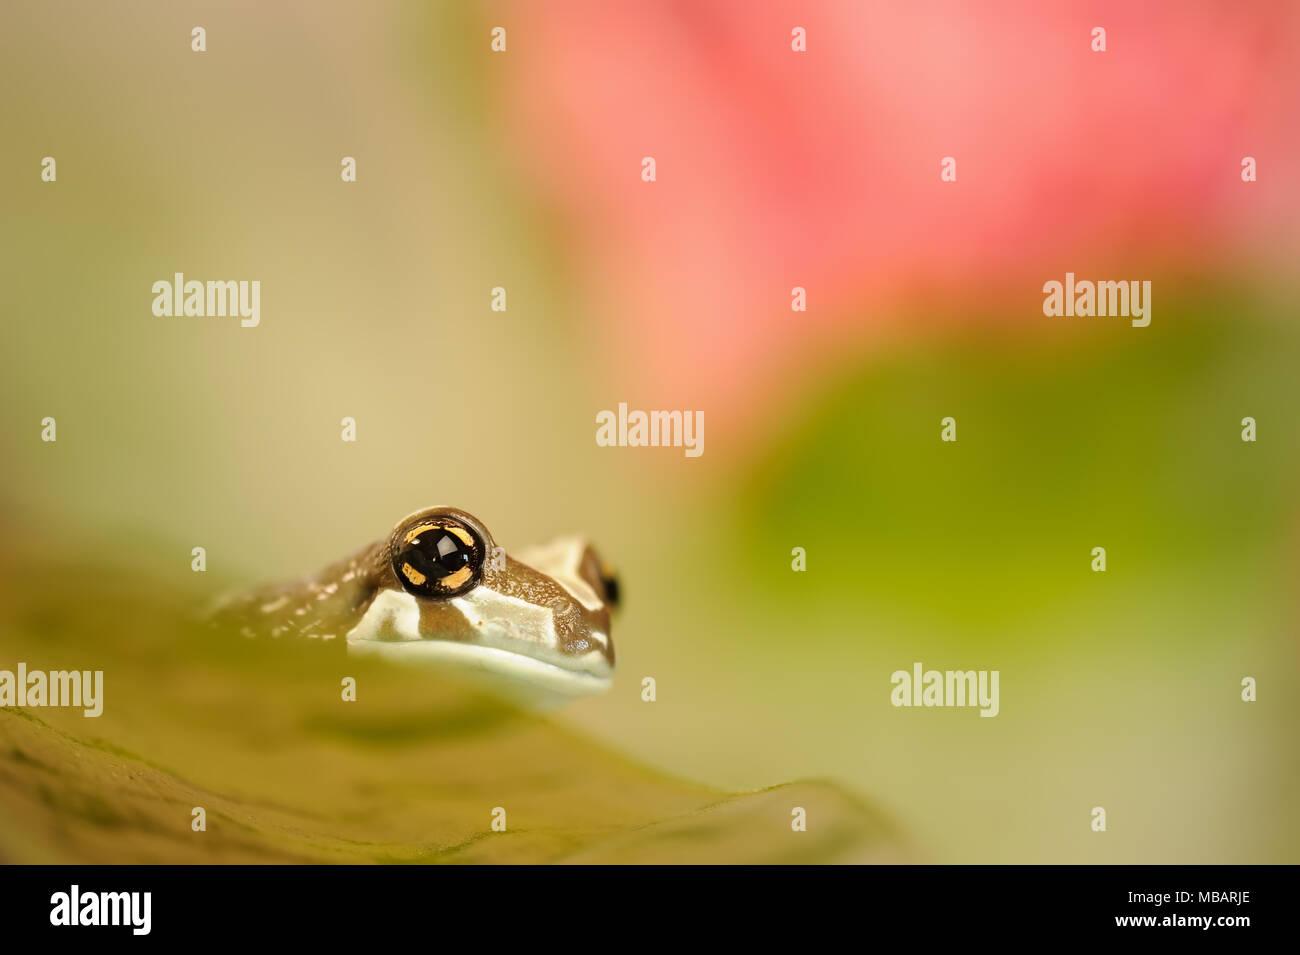 Amazon milk frog en grean leaf. Foto de stock